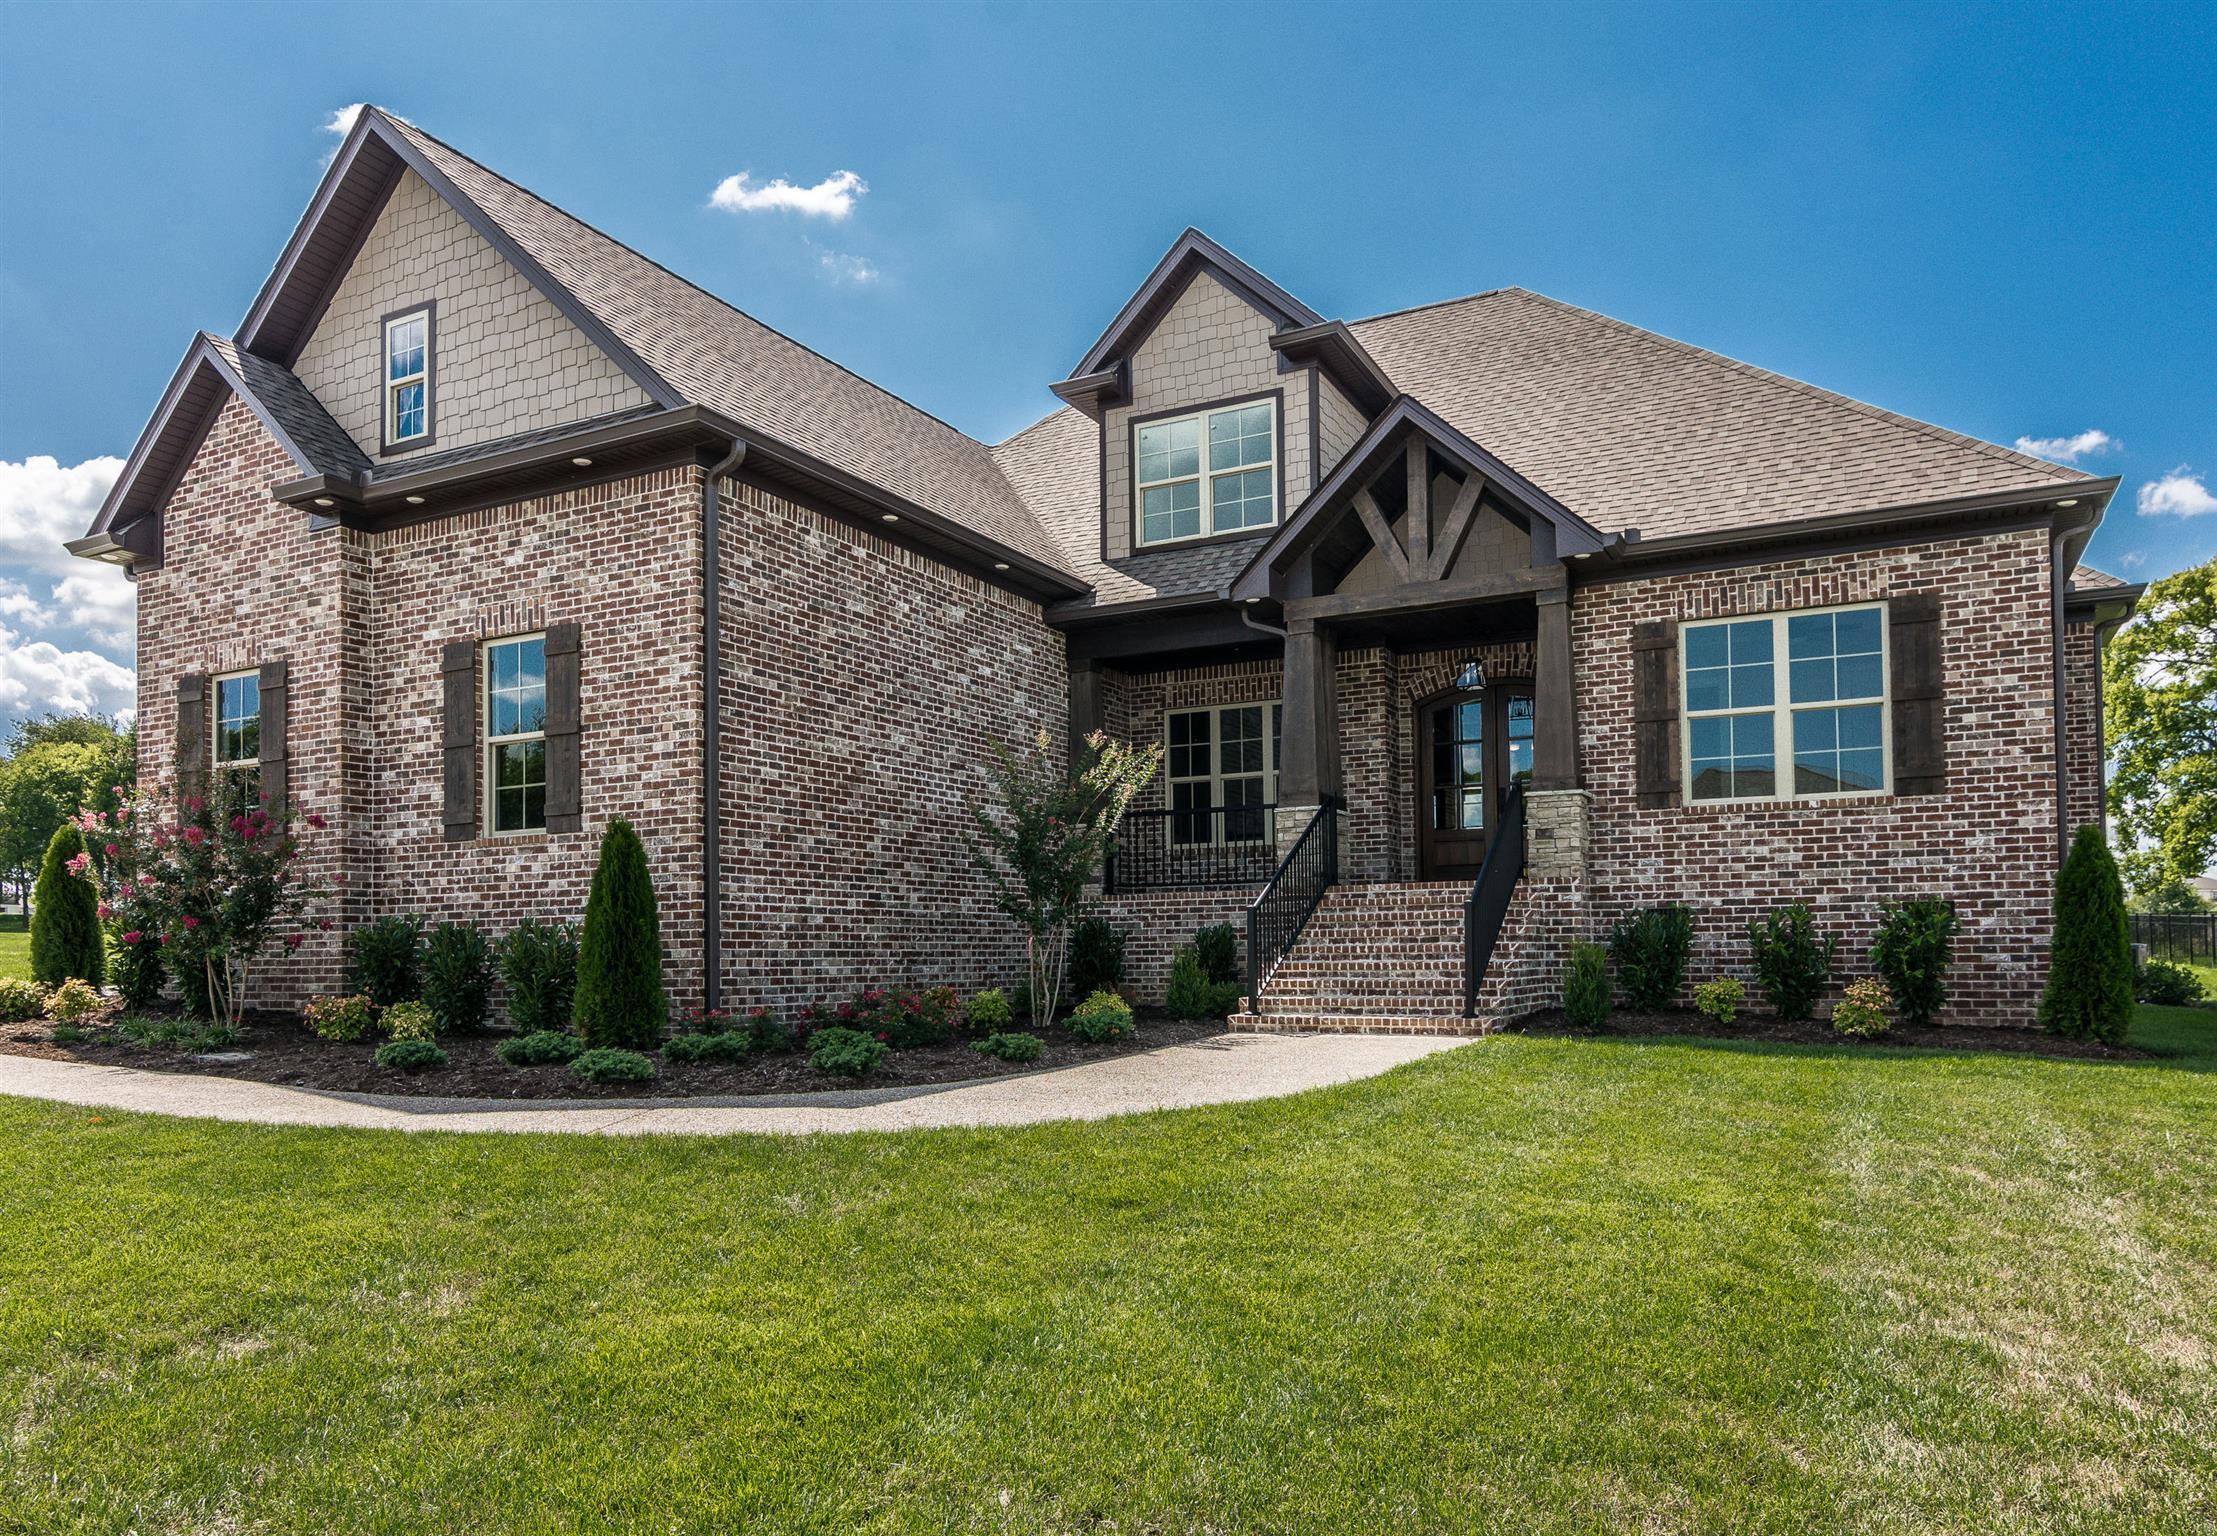 1035 Albatross Way, Gallatin in Sumner County County, TN 37066 Home for Sale